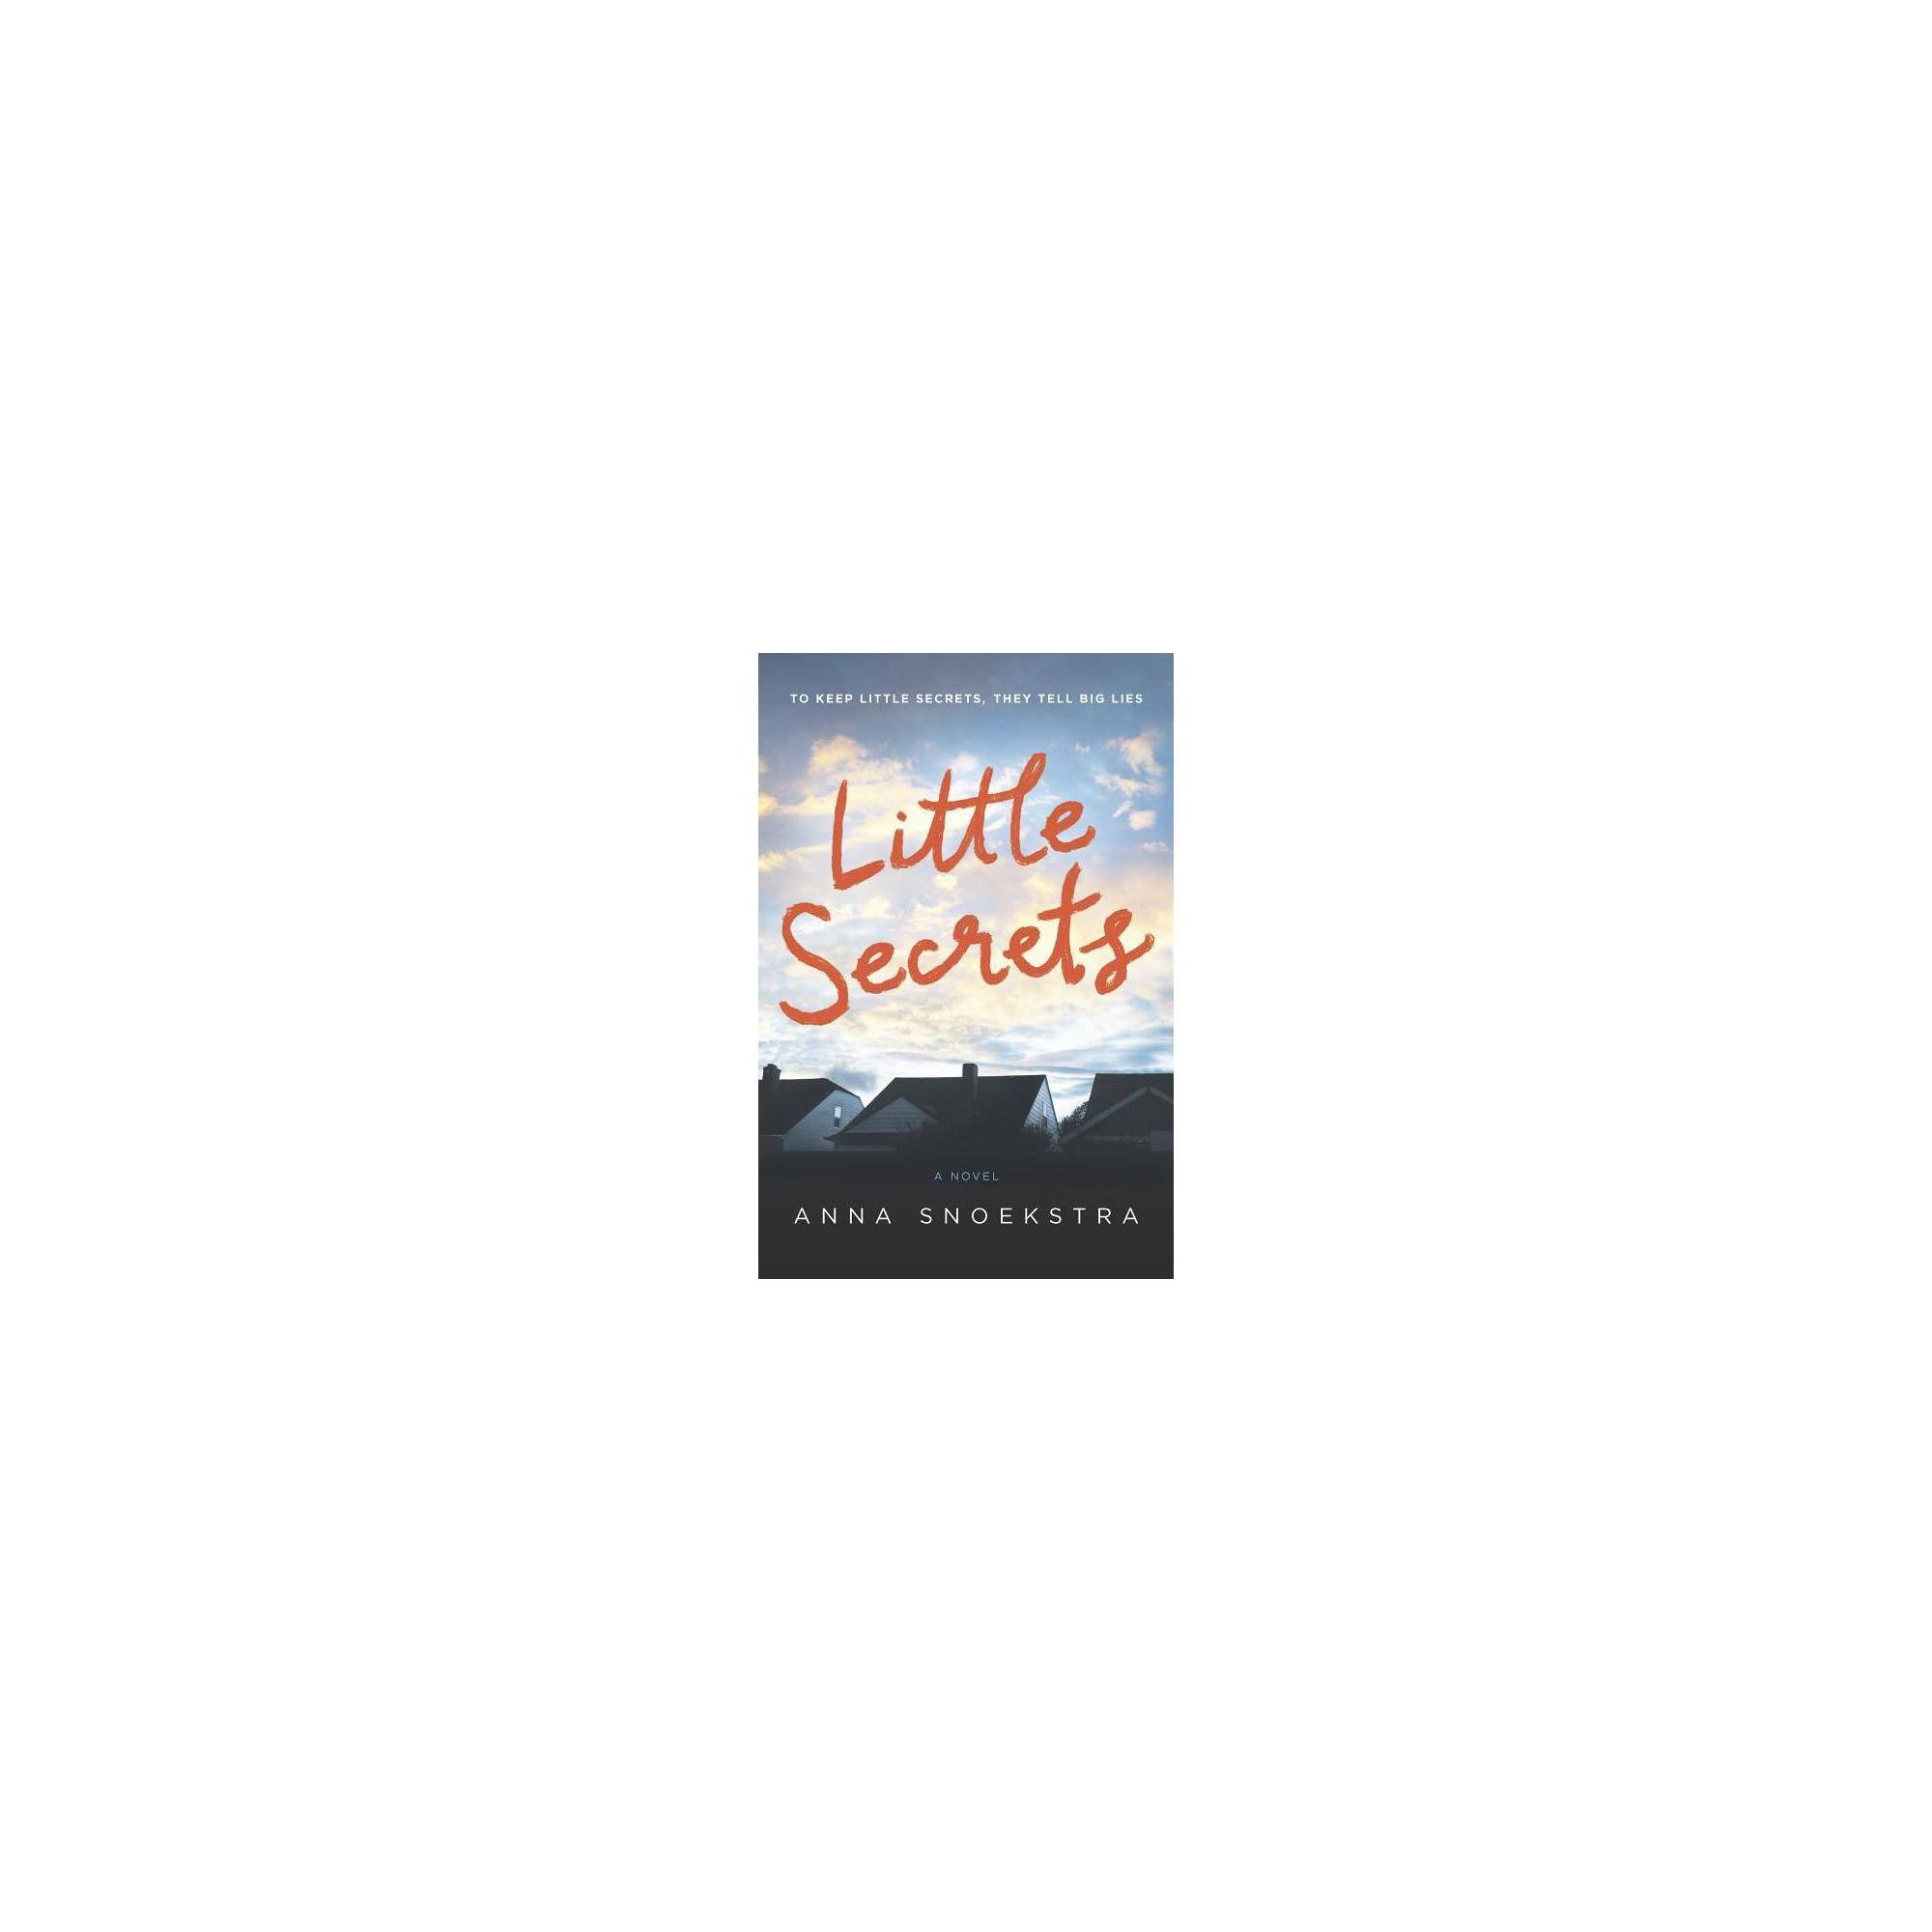 Little Secrets - by Anna Snoekstra (Paperback)